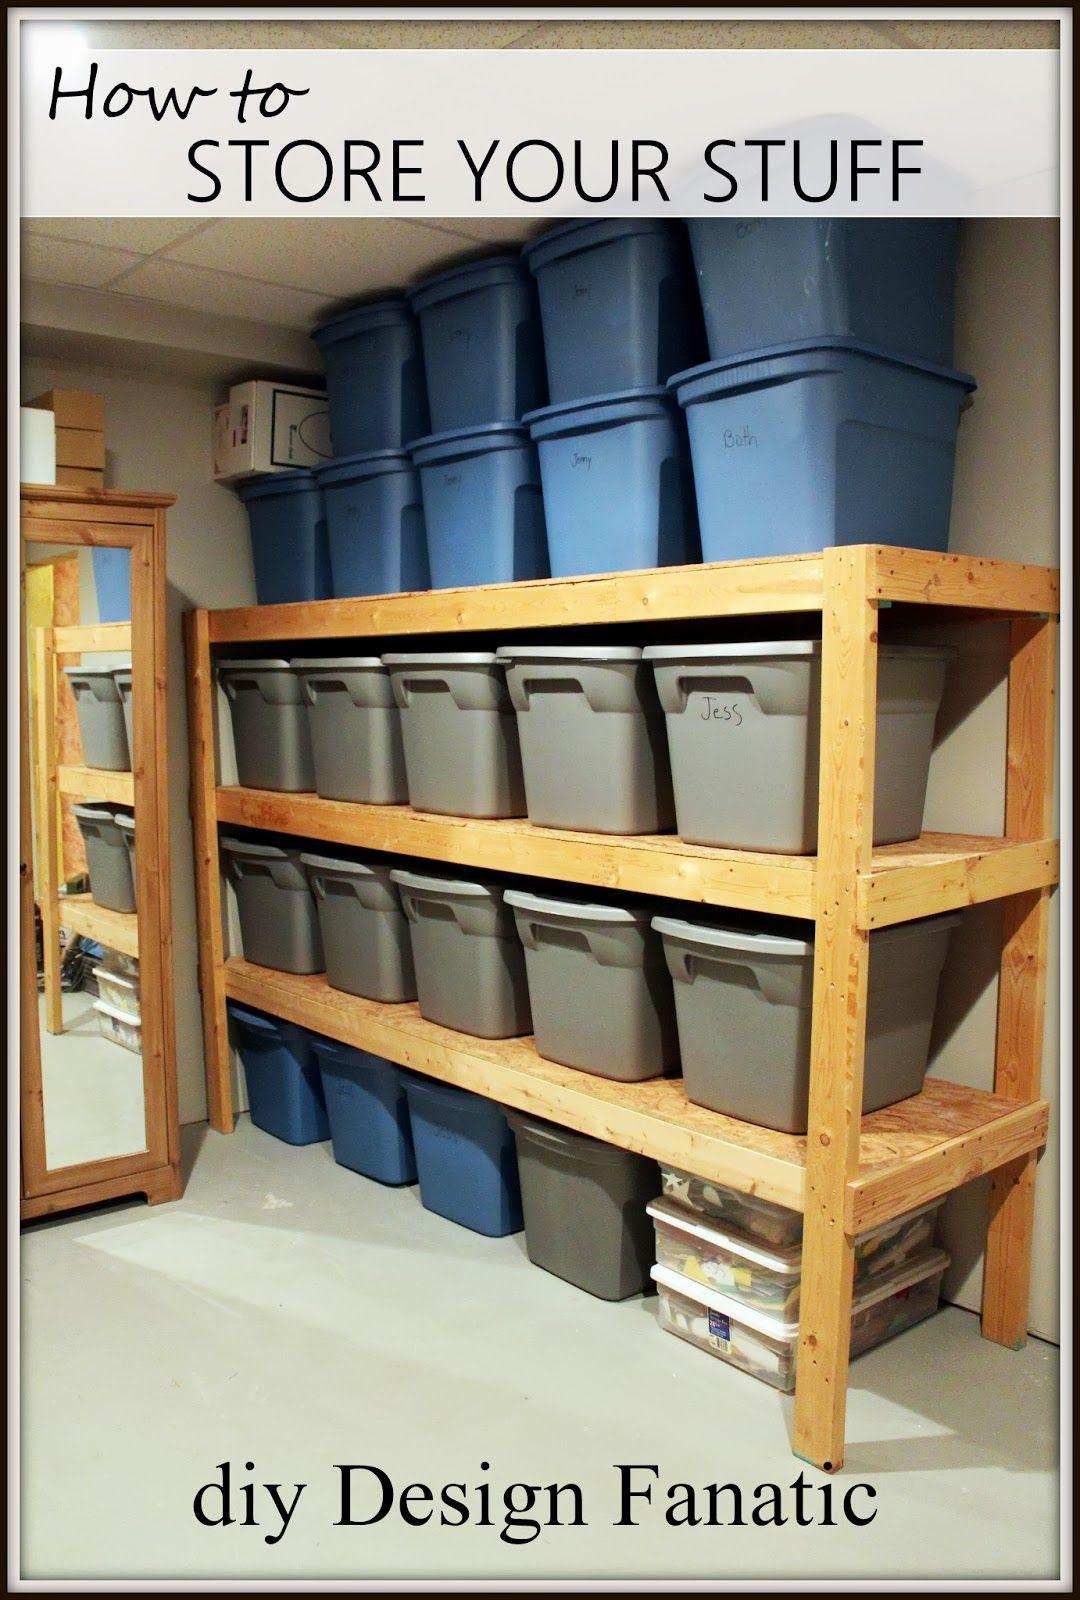 Diy Storage How To Store Your Stuff Diy Storage Shelves Diy